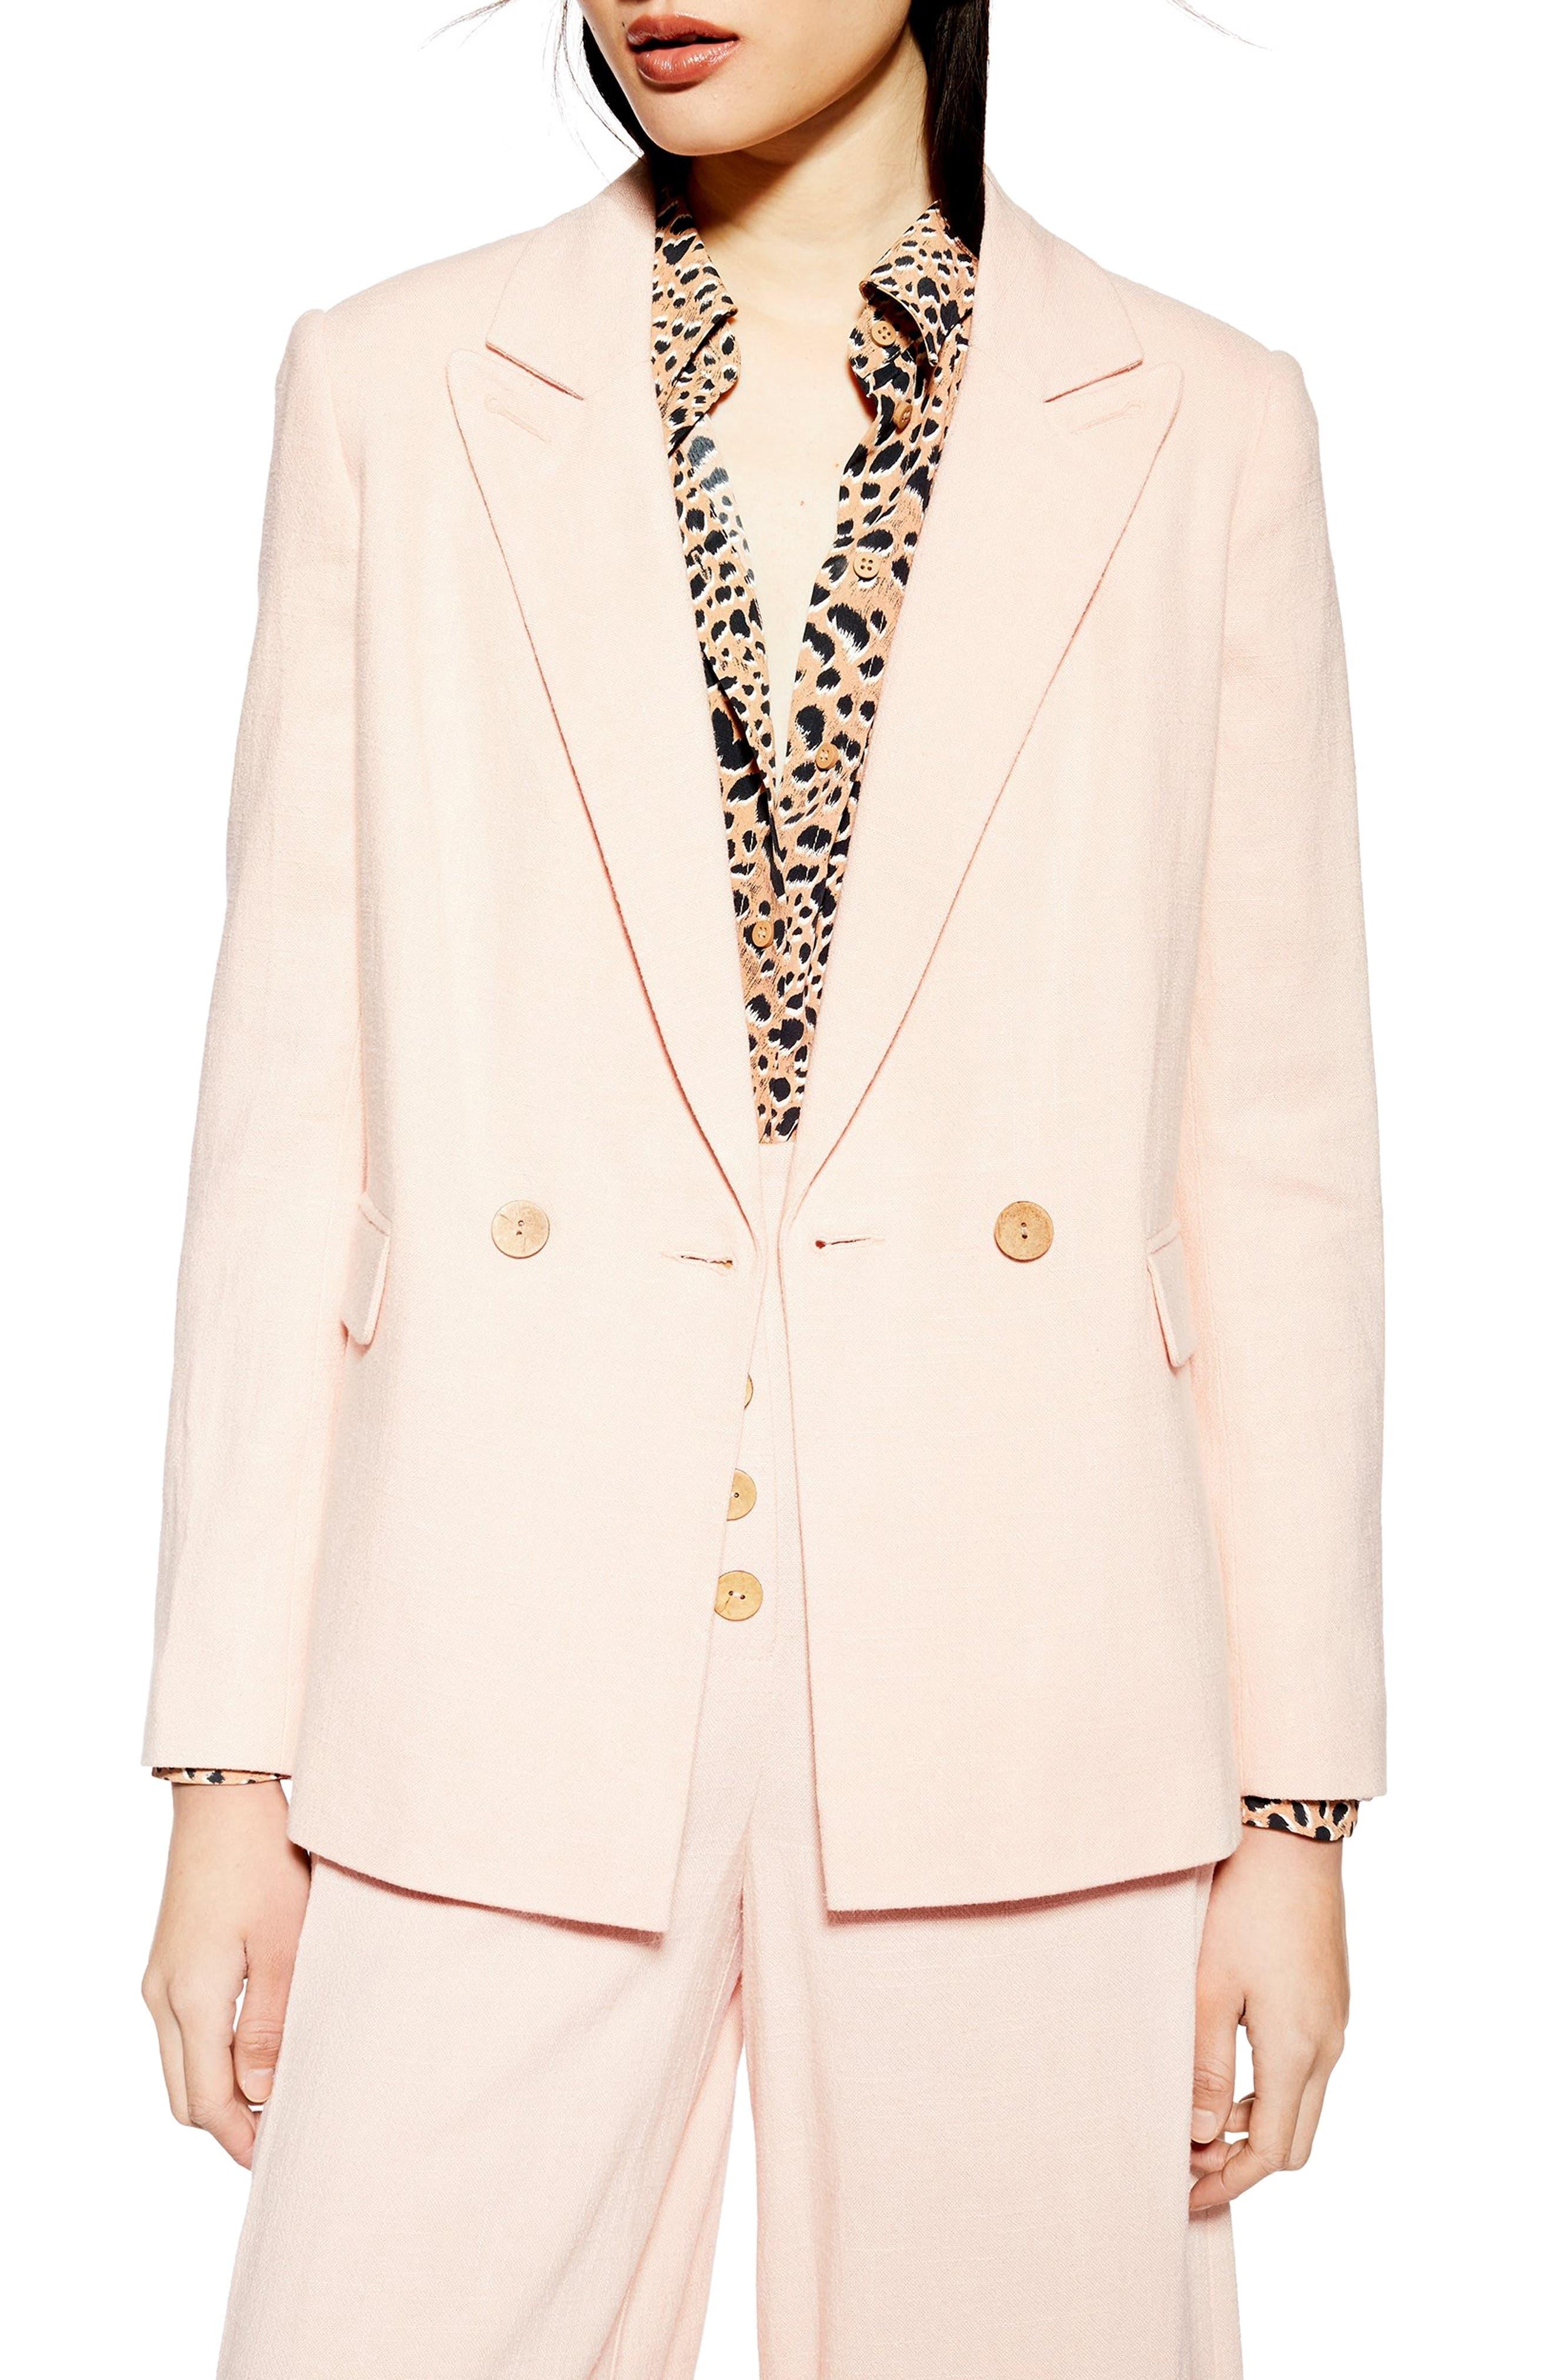 Topshop Coco Linen Blazer Discount